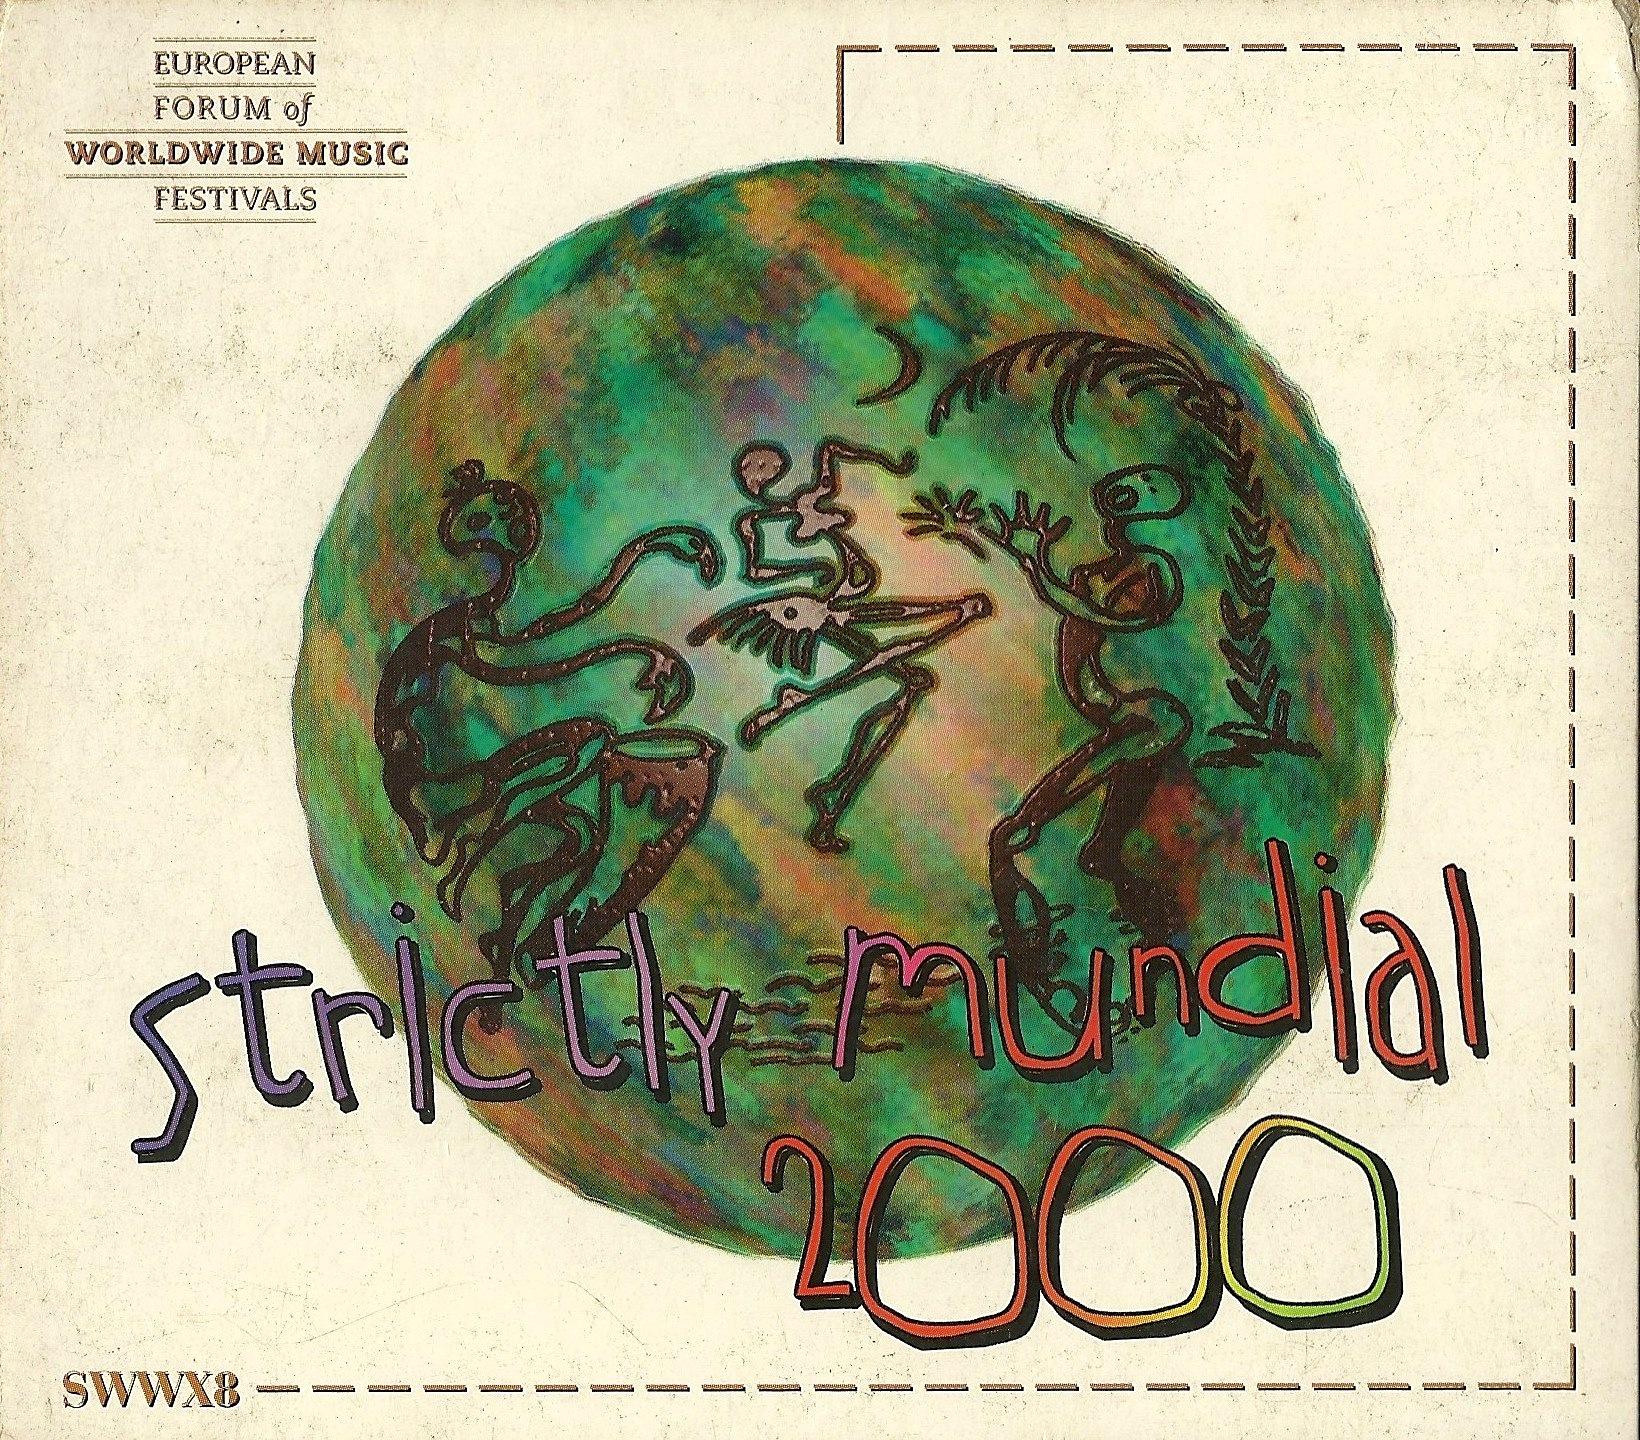 60 2000 Strictly Mundial 2000.jpg